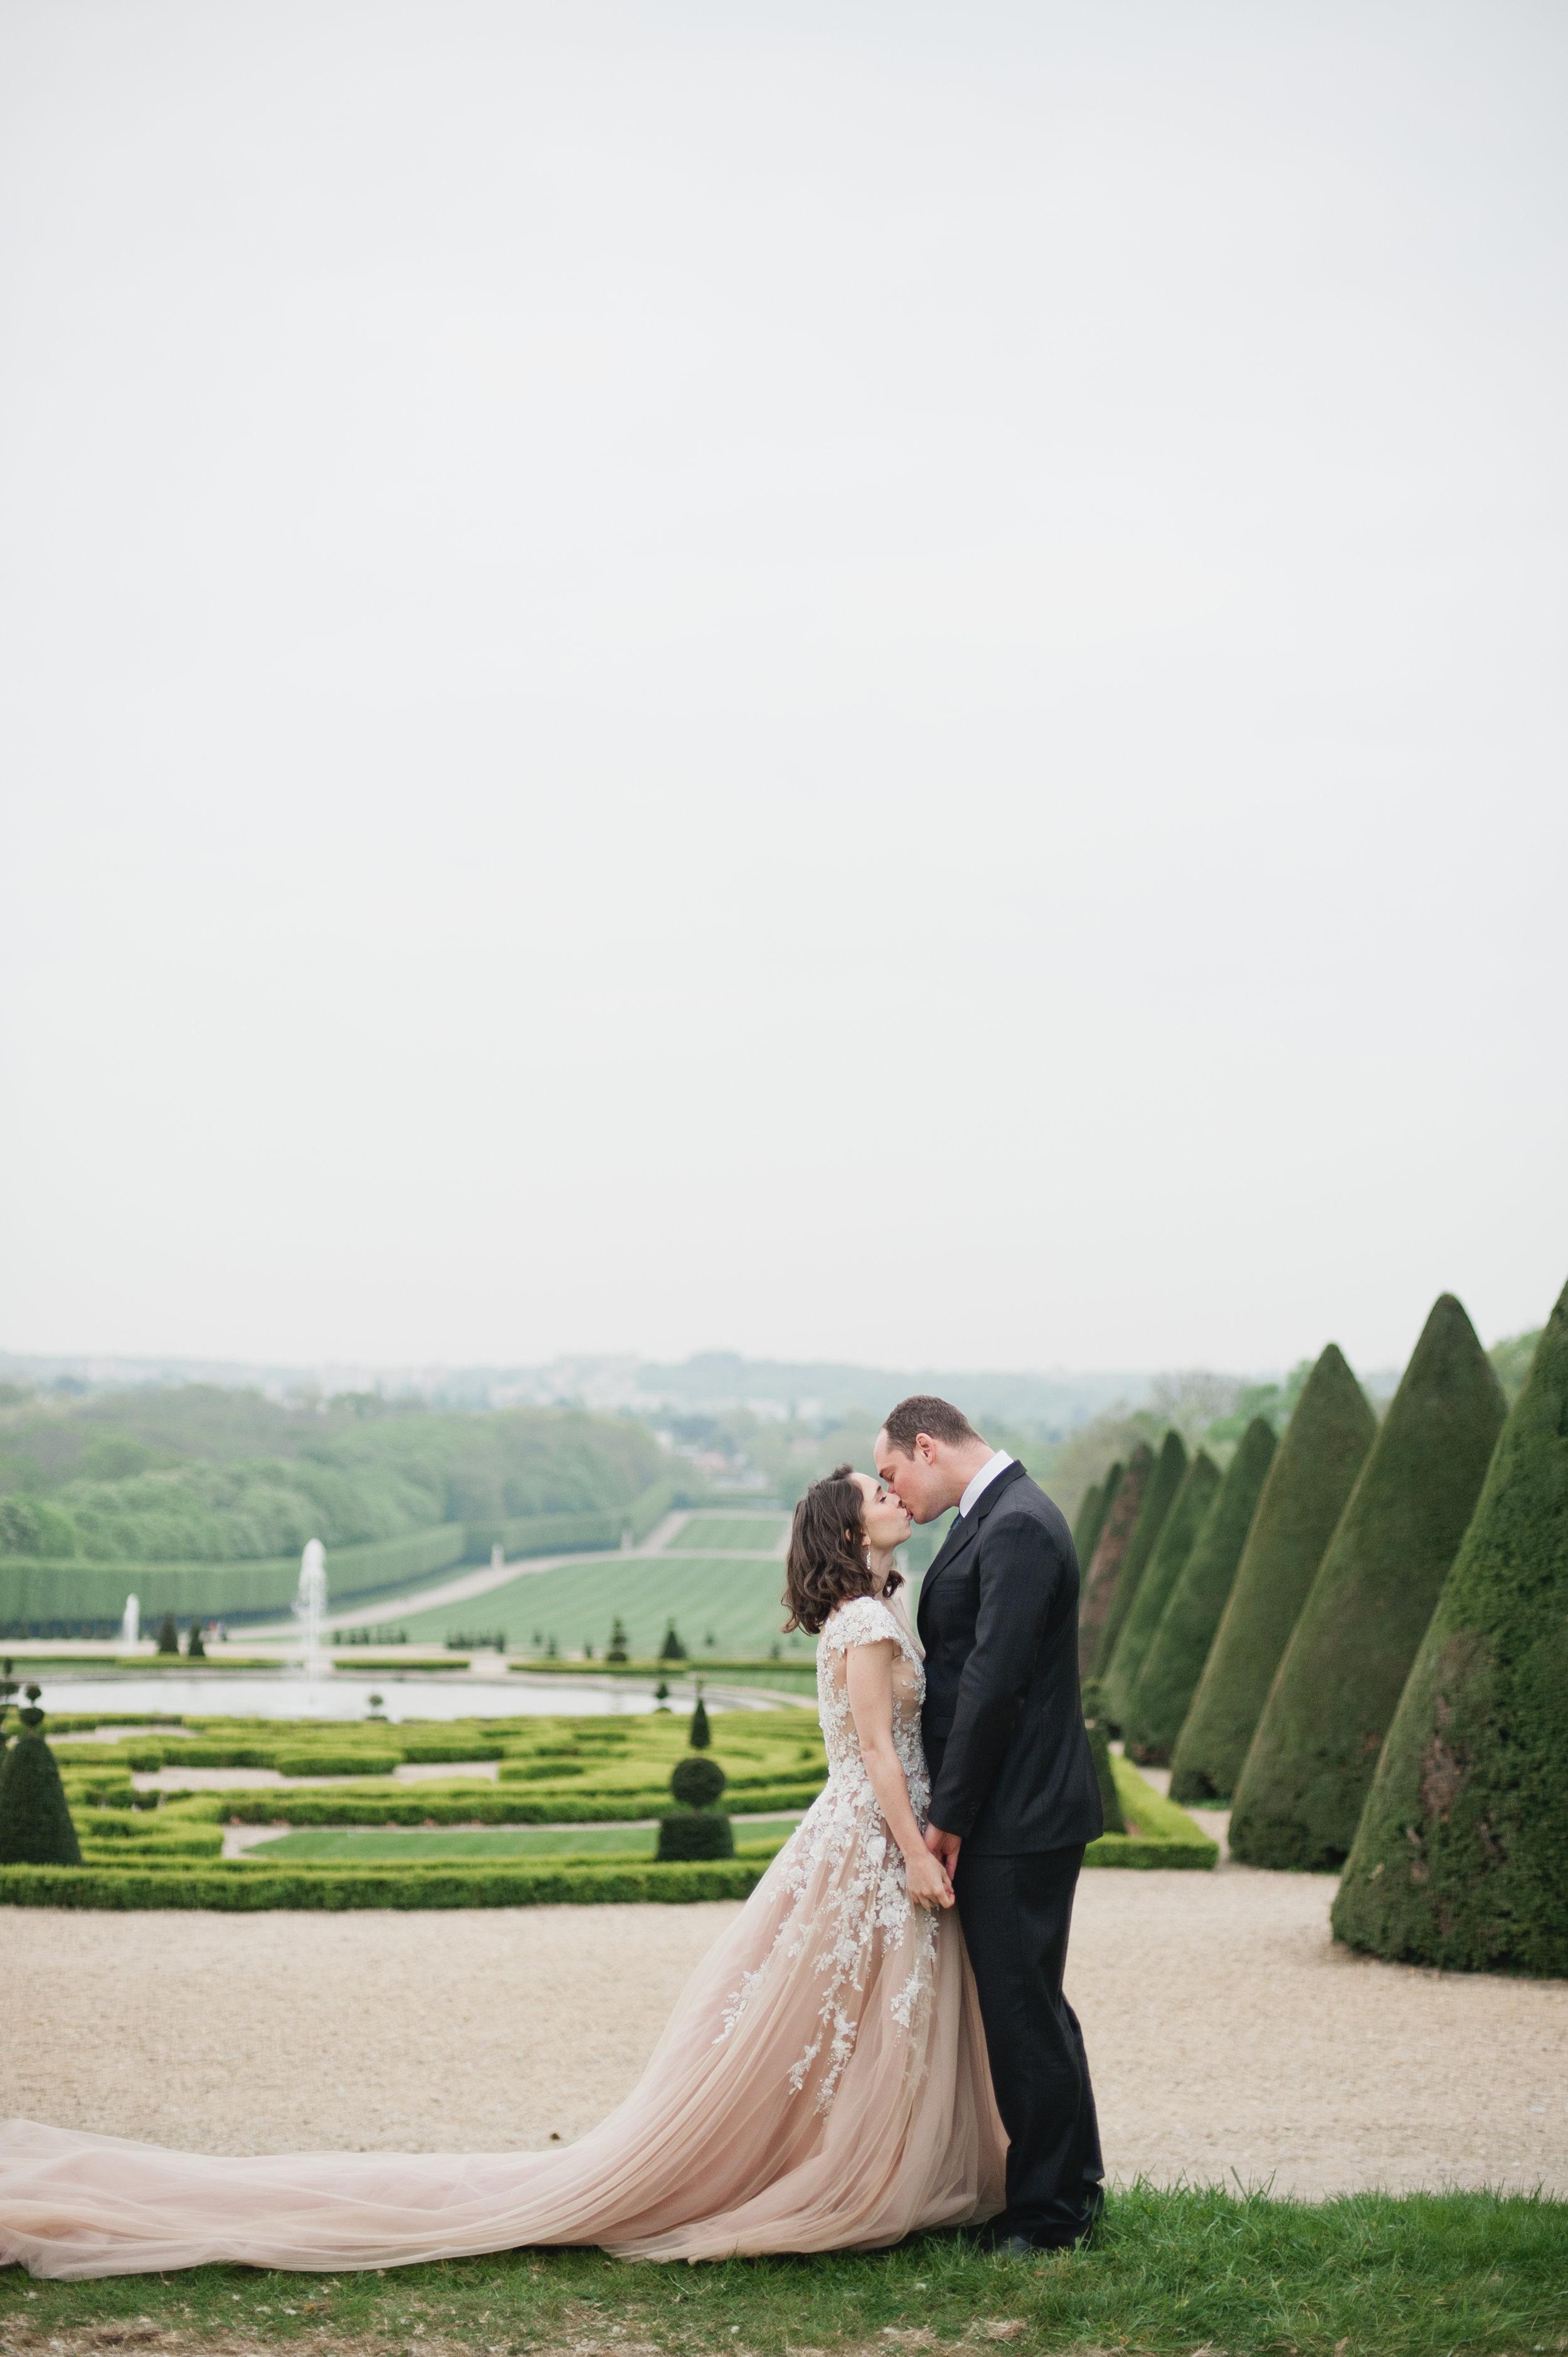 Chateau Sceaux Wedding | Paris Wedding | Meredith McKee Photography | Fine Art Wedding Blog | Joy Wed | Joyfoley Weddings | Canadian Wedding Blog | Paris Photographer | Blush Wedding Dress